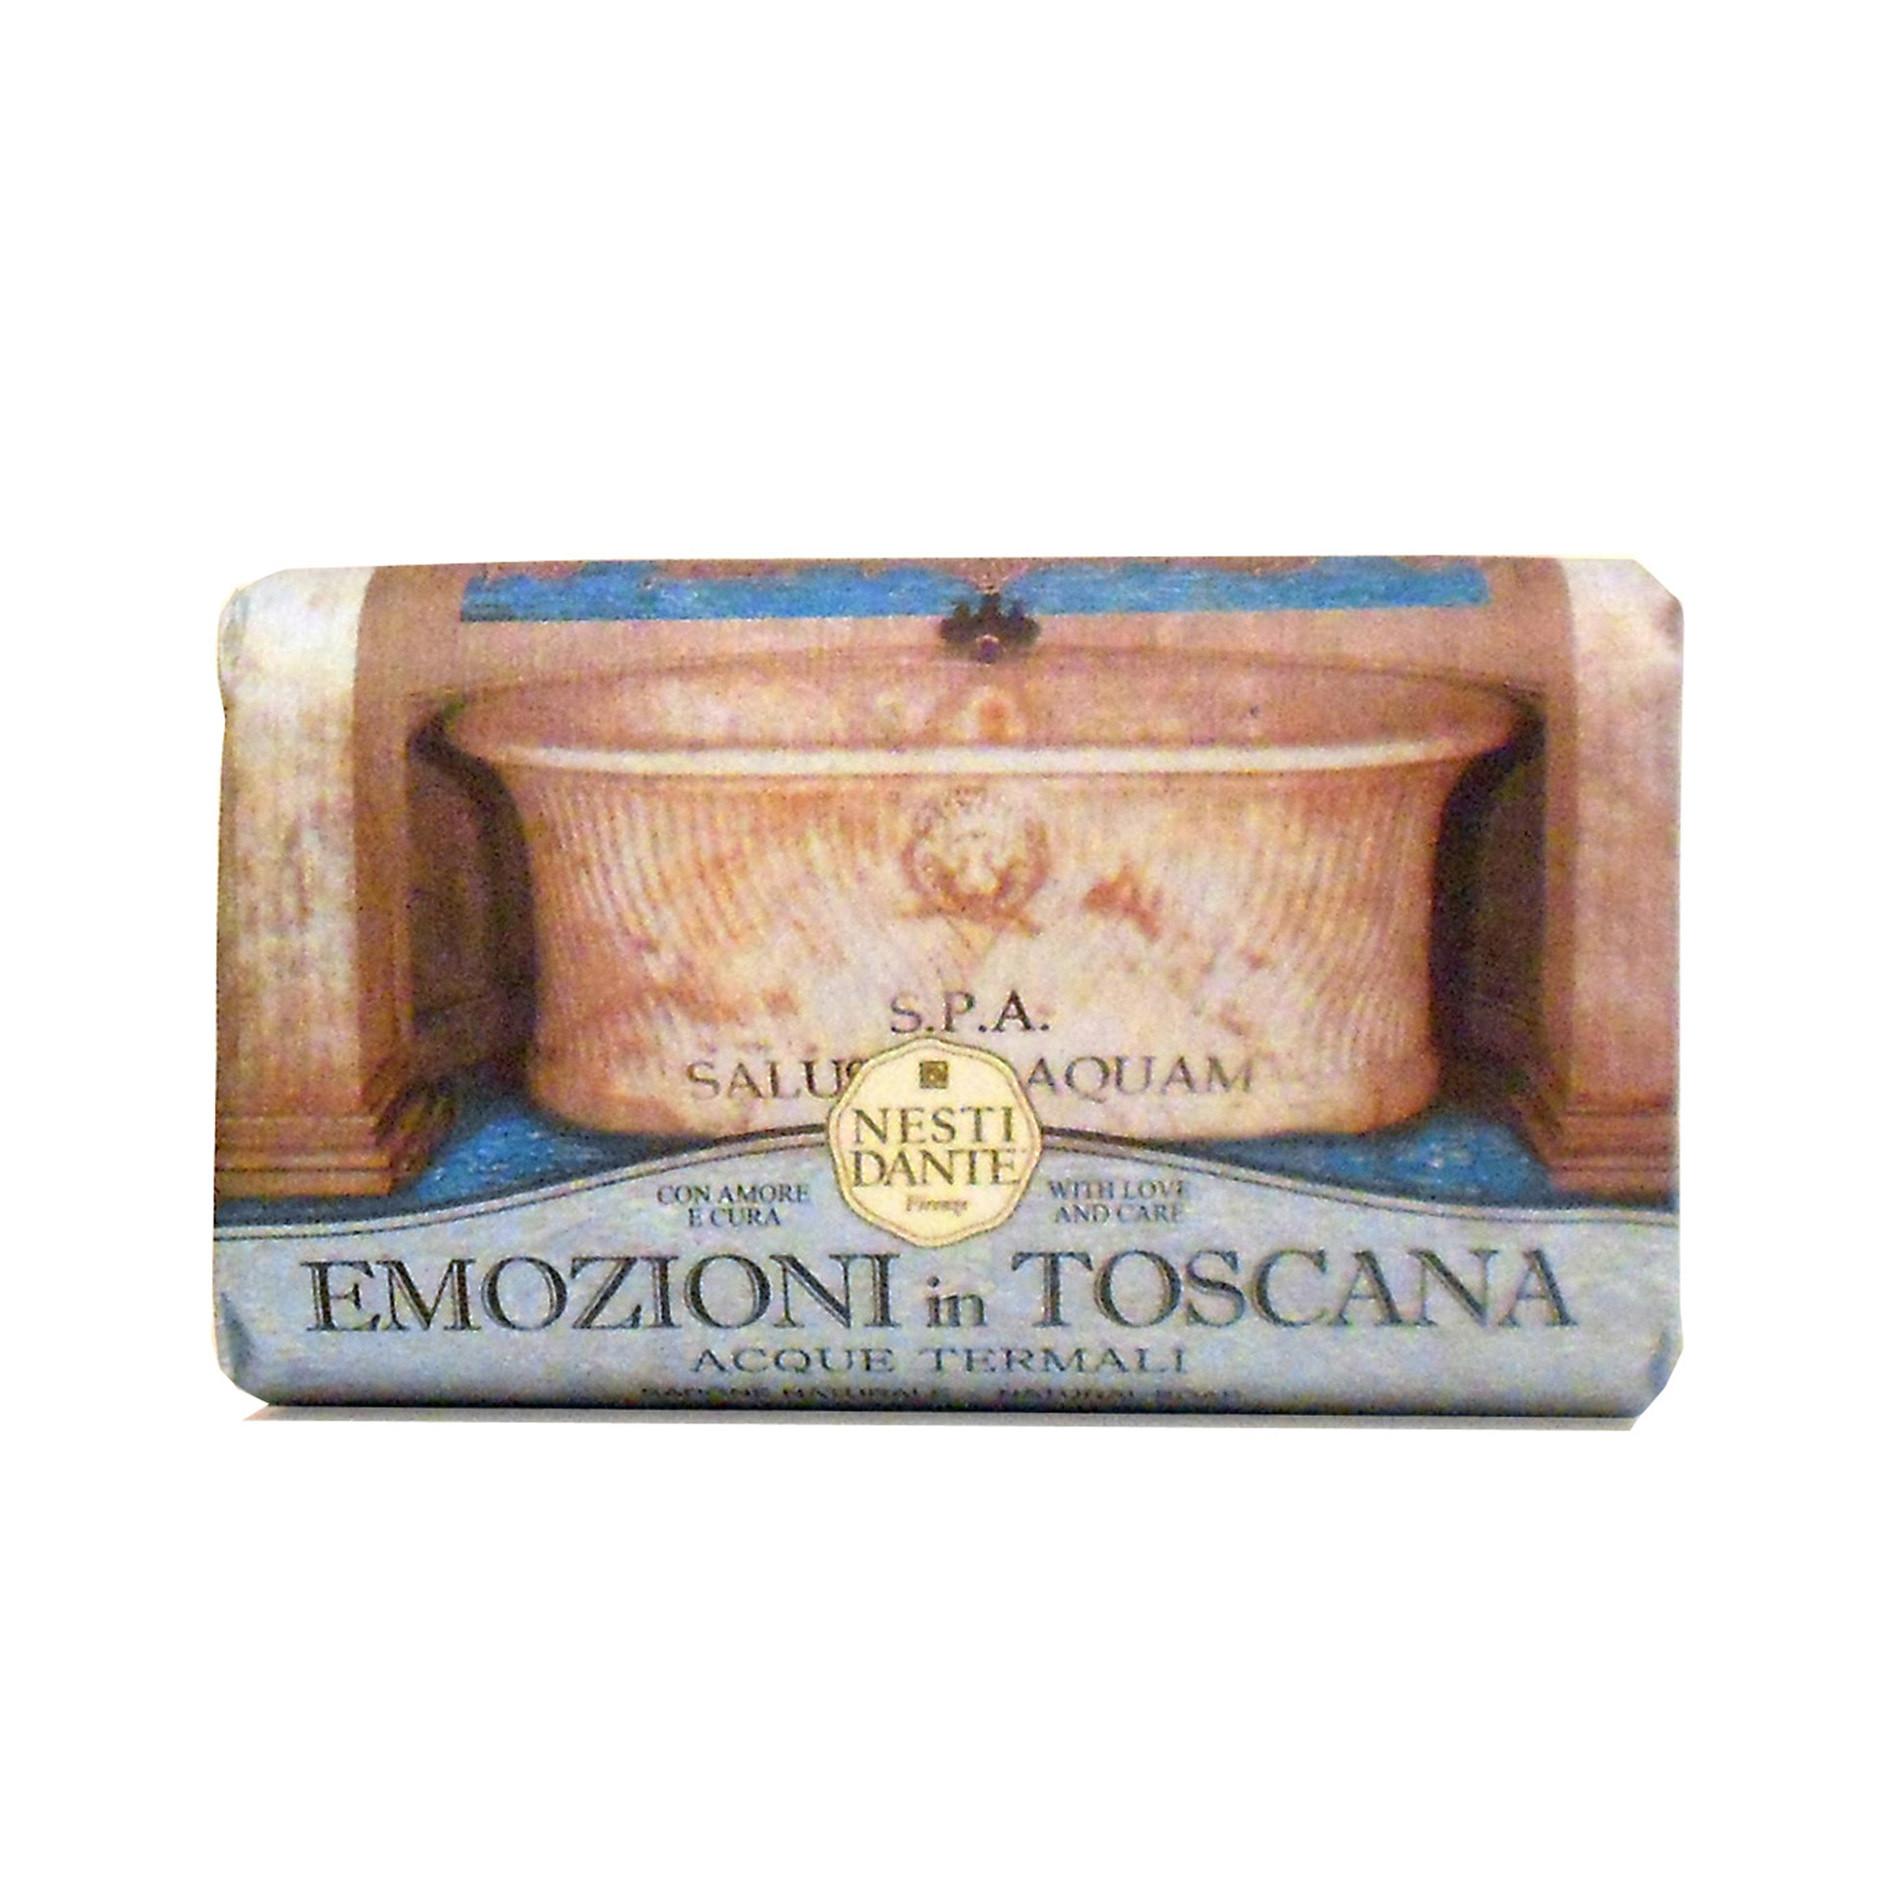 Emozioni In Toscana - Acque Termali, Azzurro, large image number 0